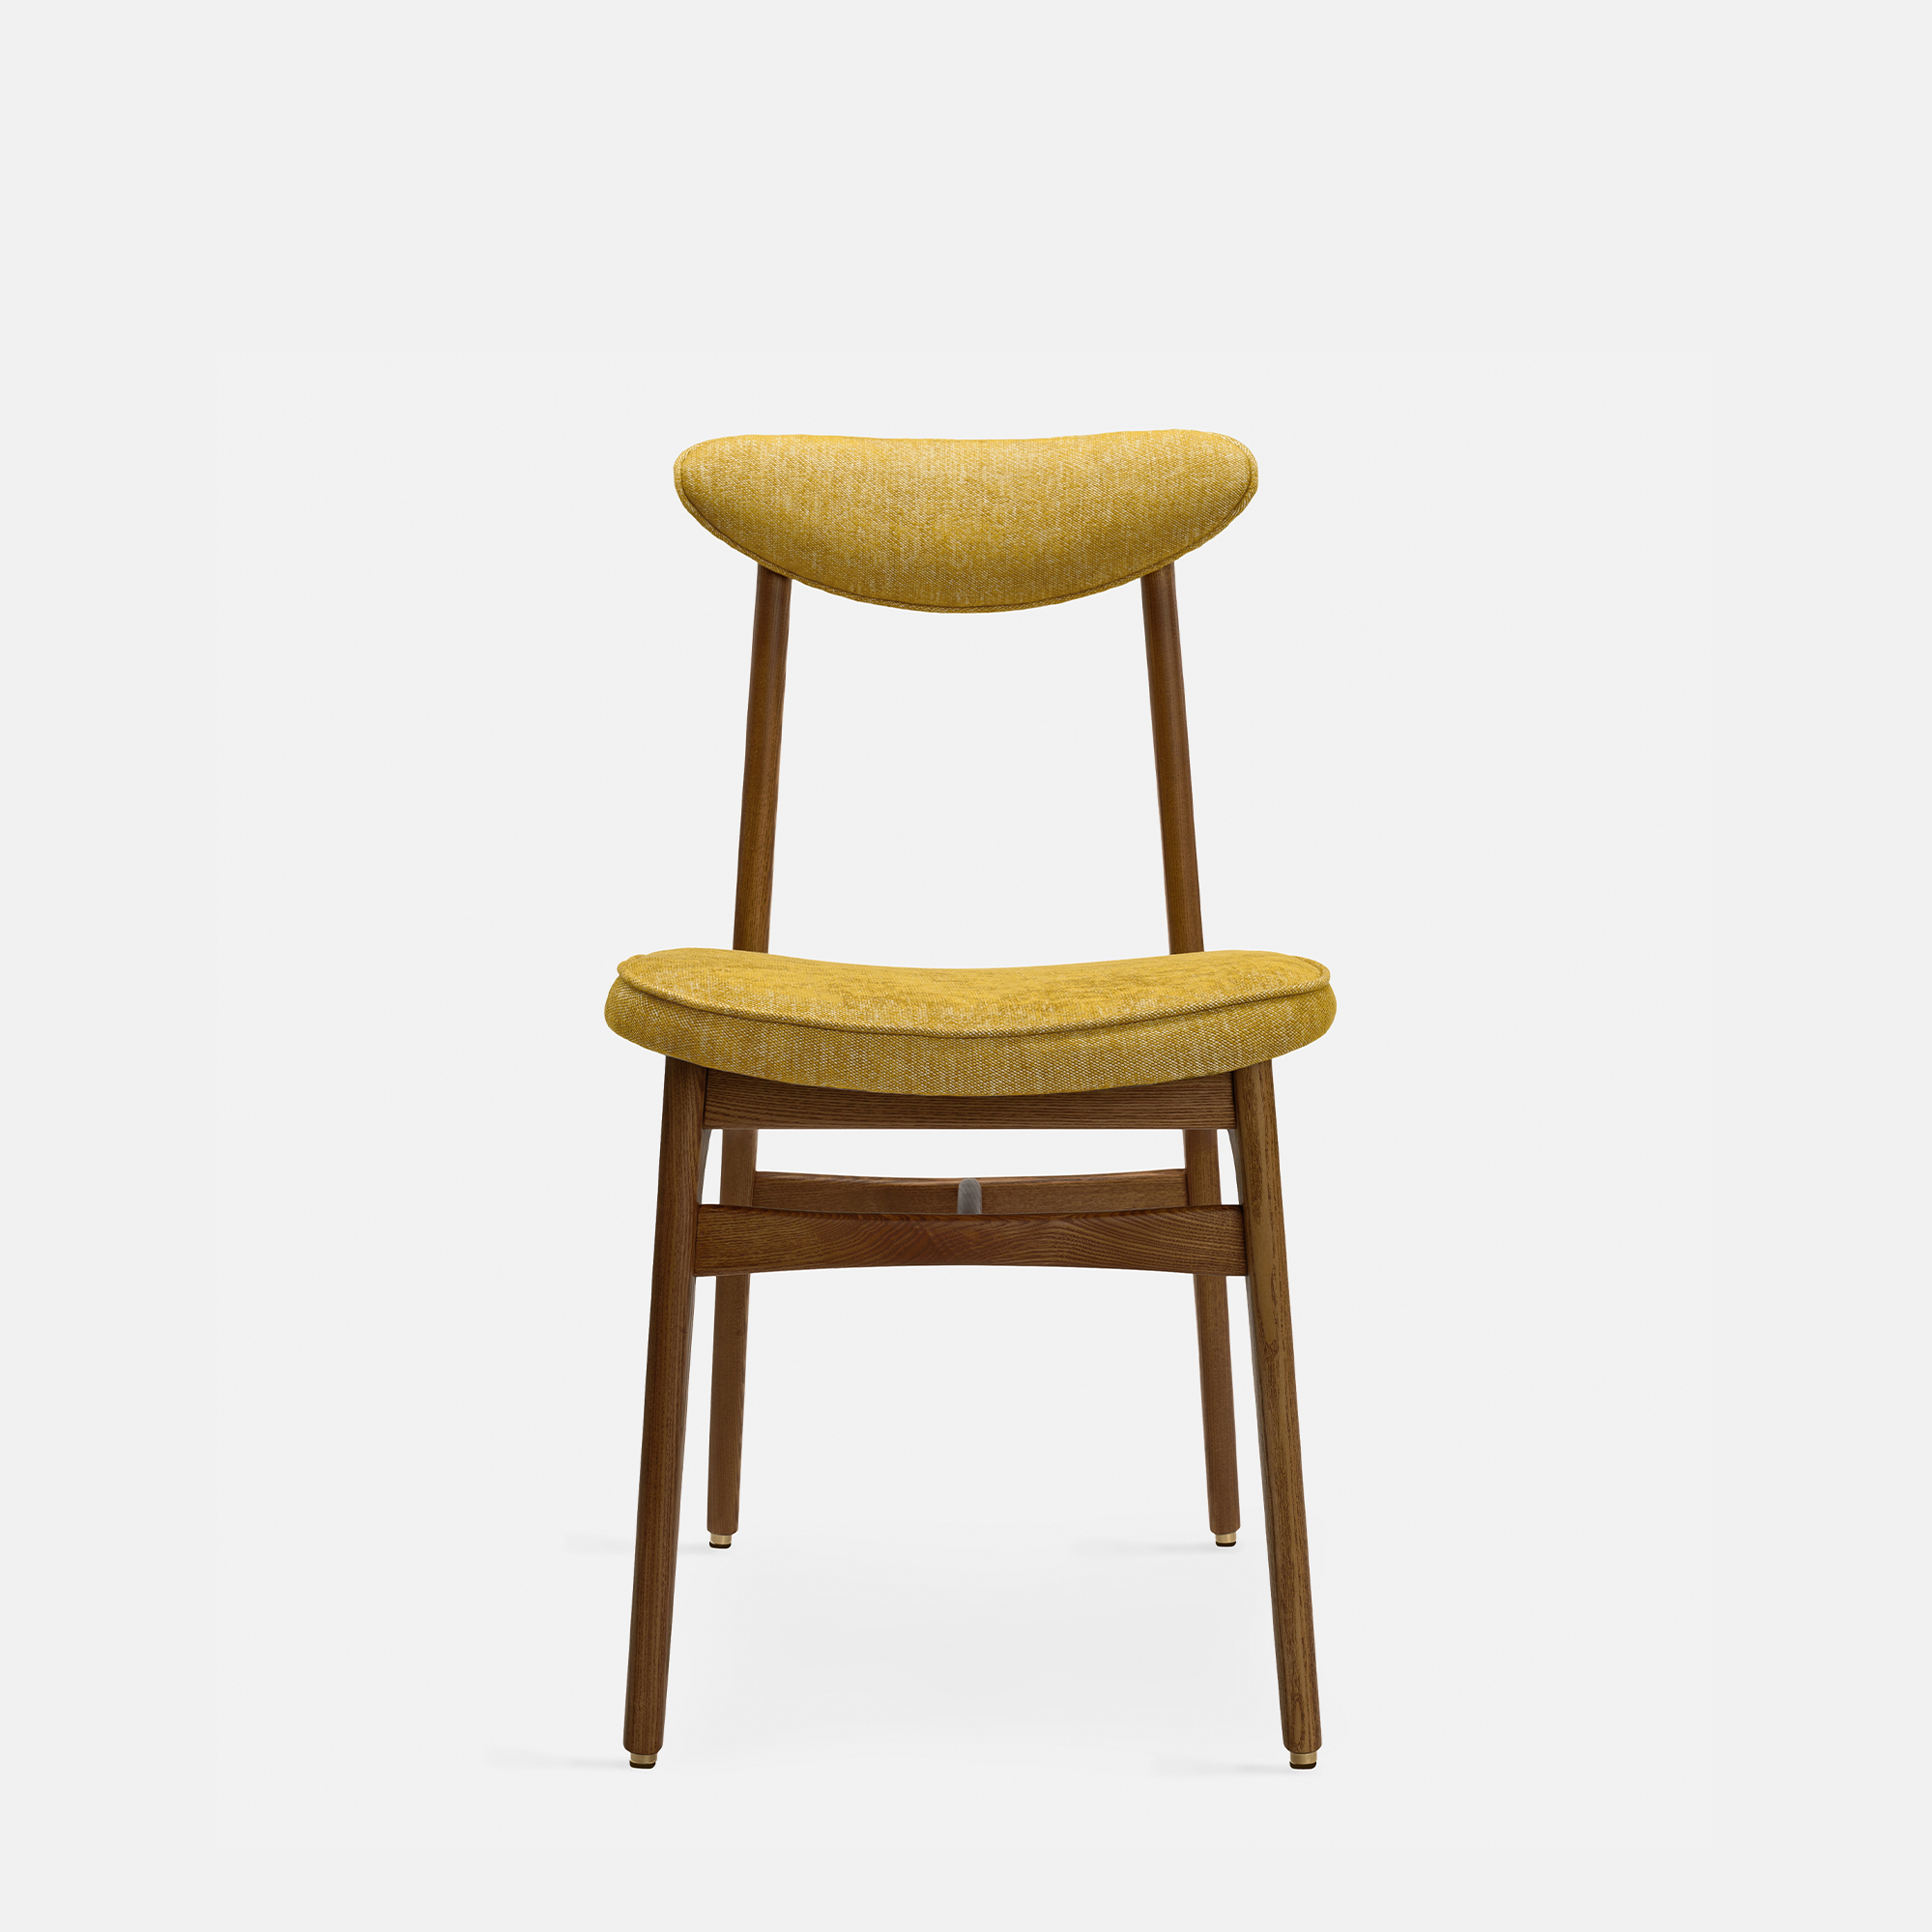 366-Concept-200-190-Chair-W03-Loft-Mustard-front